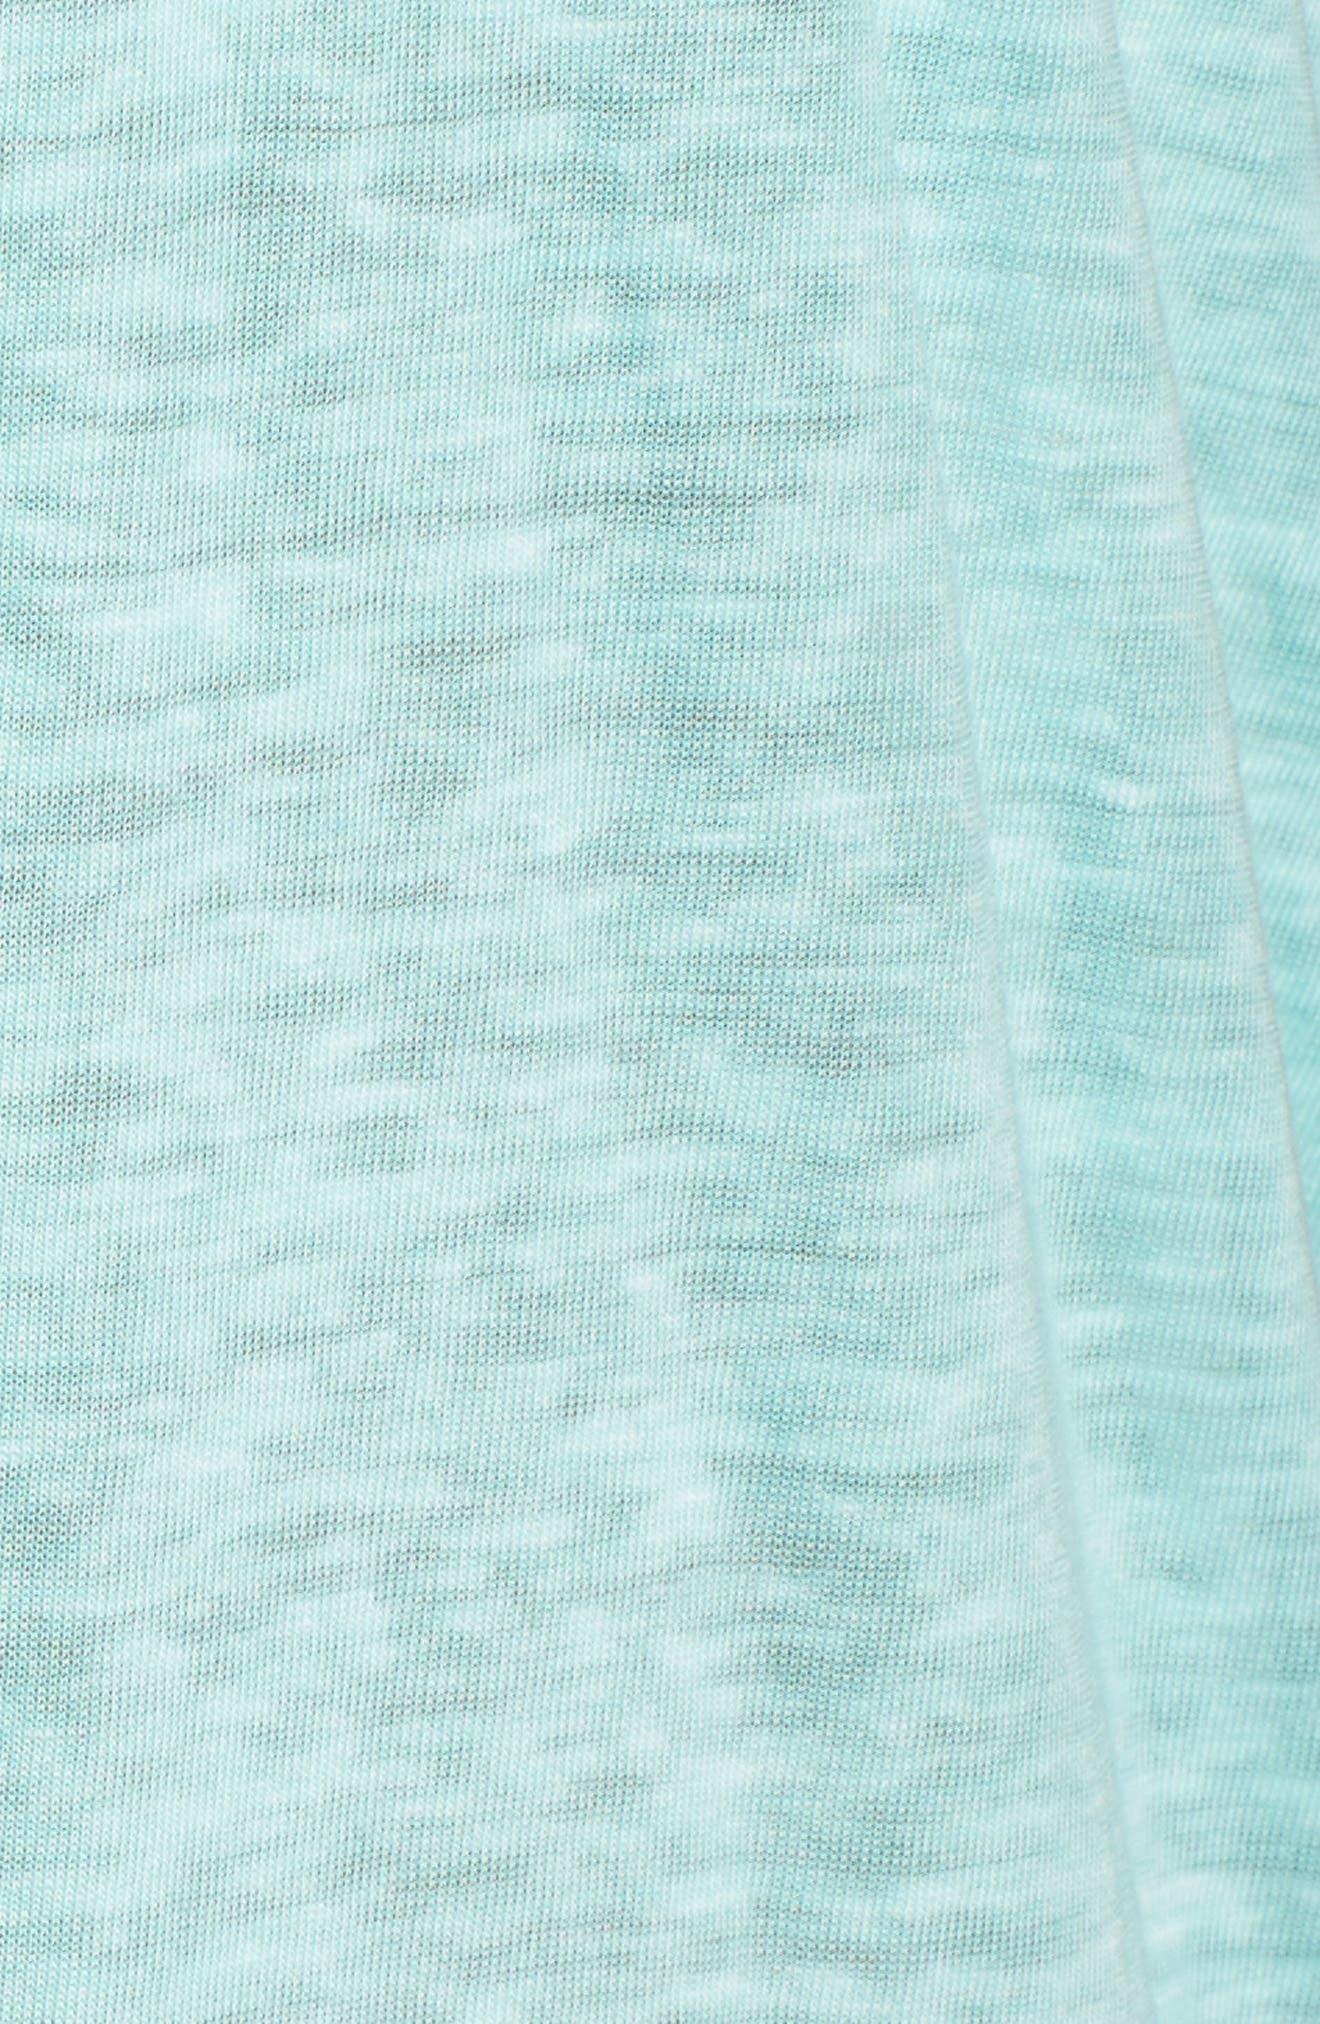 Maxi Cover-Up Dress,                             Alternate thumbnail 24, color,